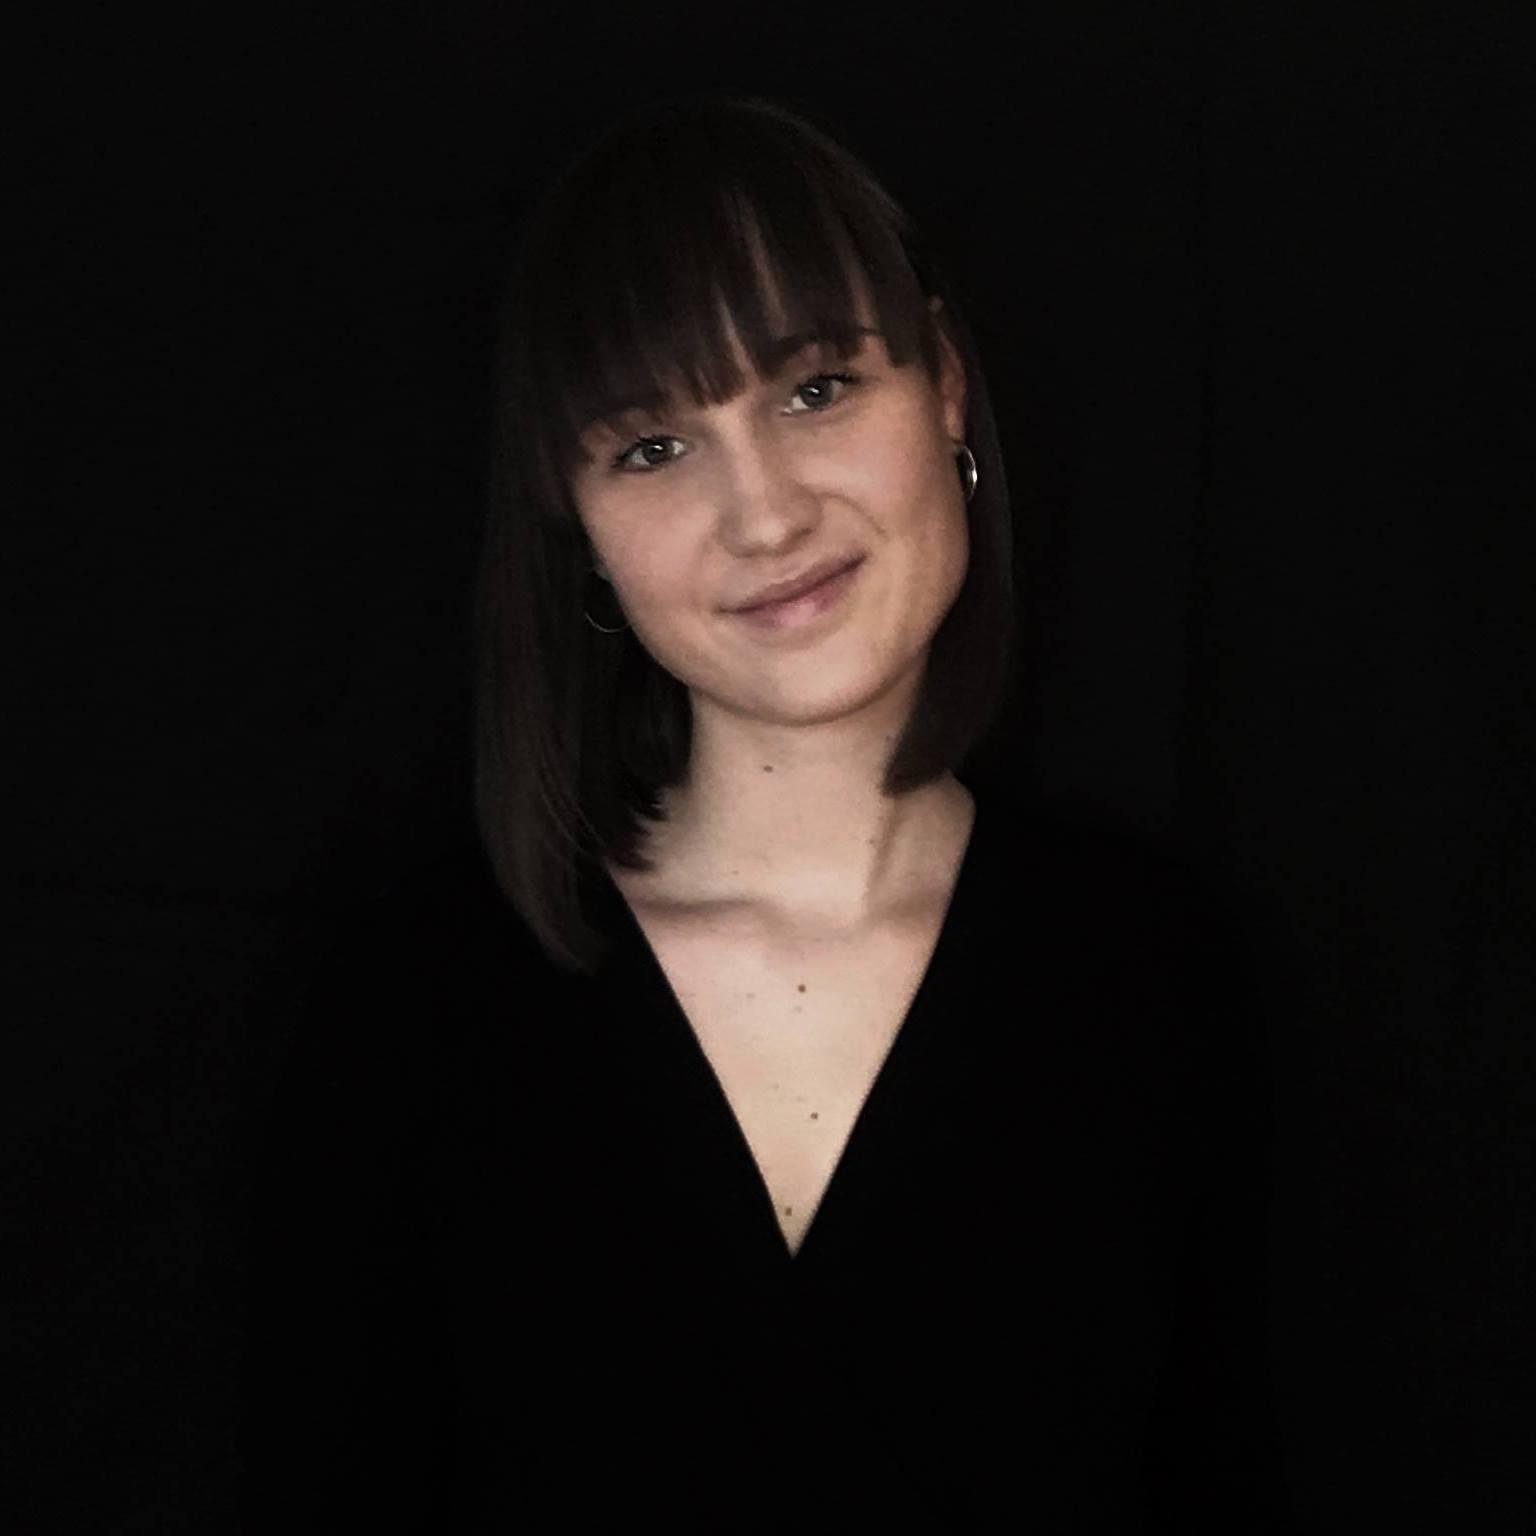 Katrine Dyhr Mohr